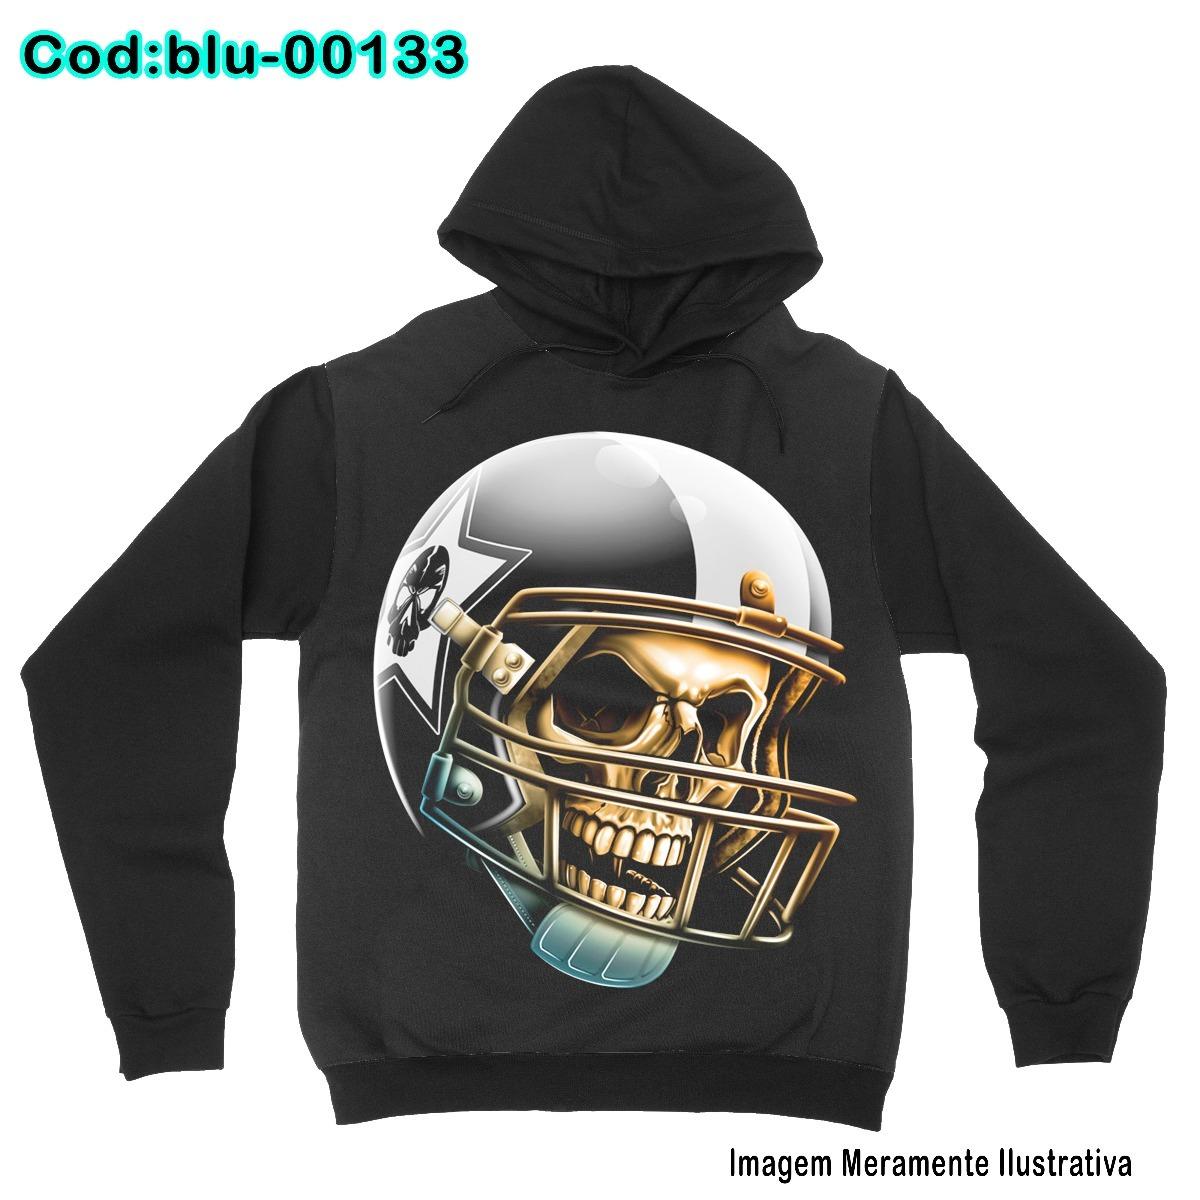 blusa de frio moletom skull futebol americano -blu0133. Carregando zoom. eb65b065348ef